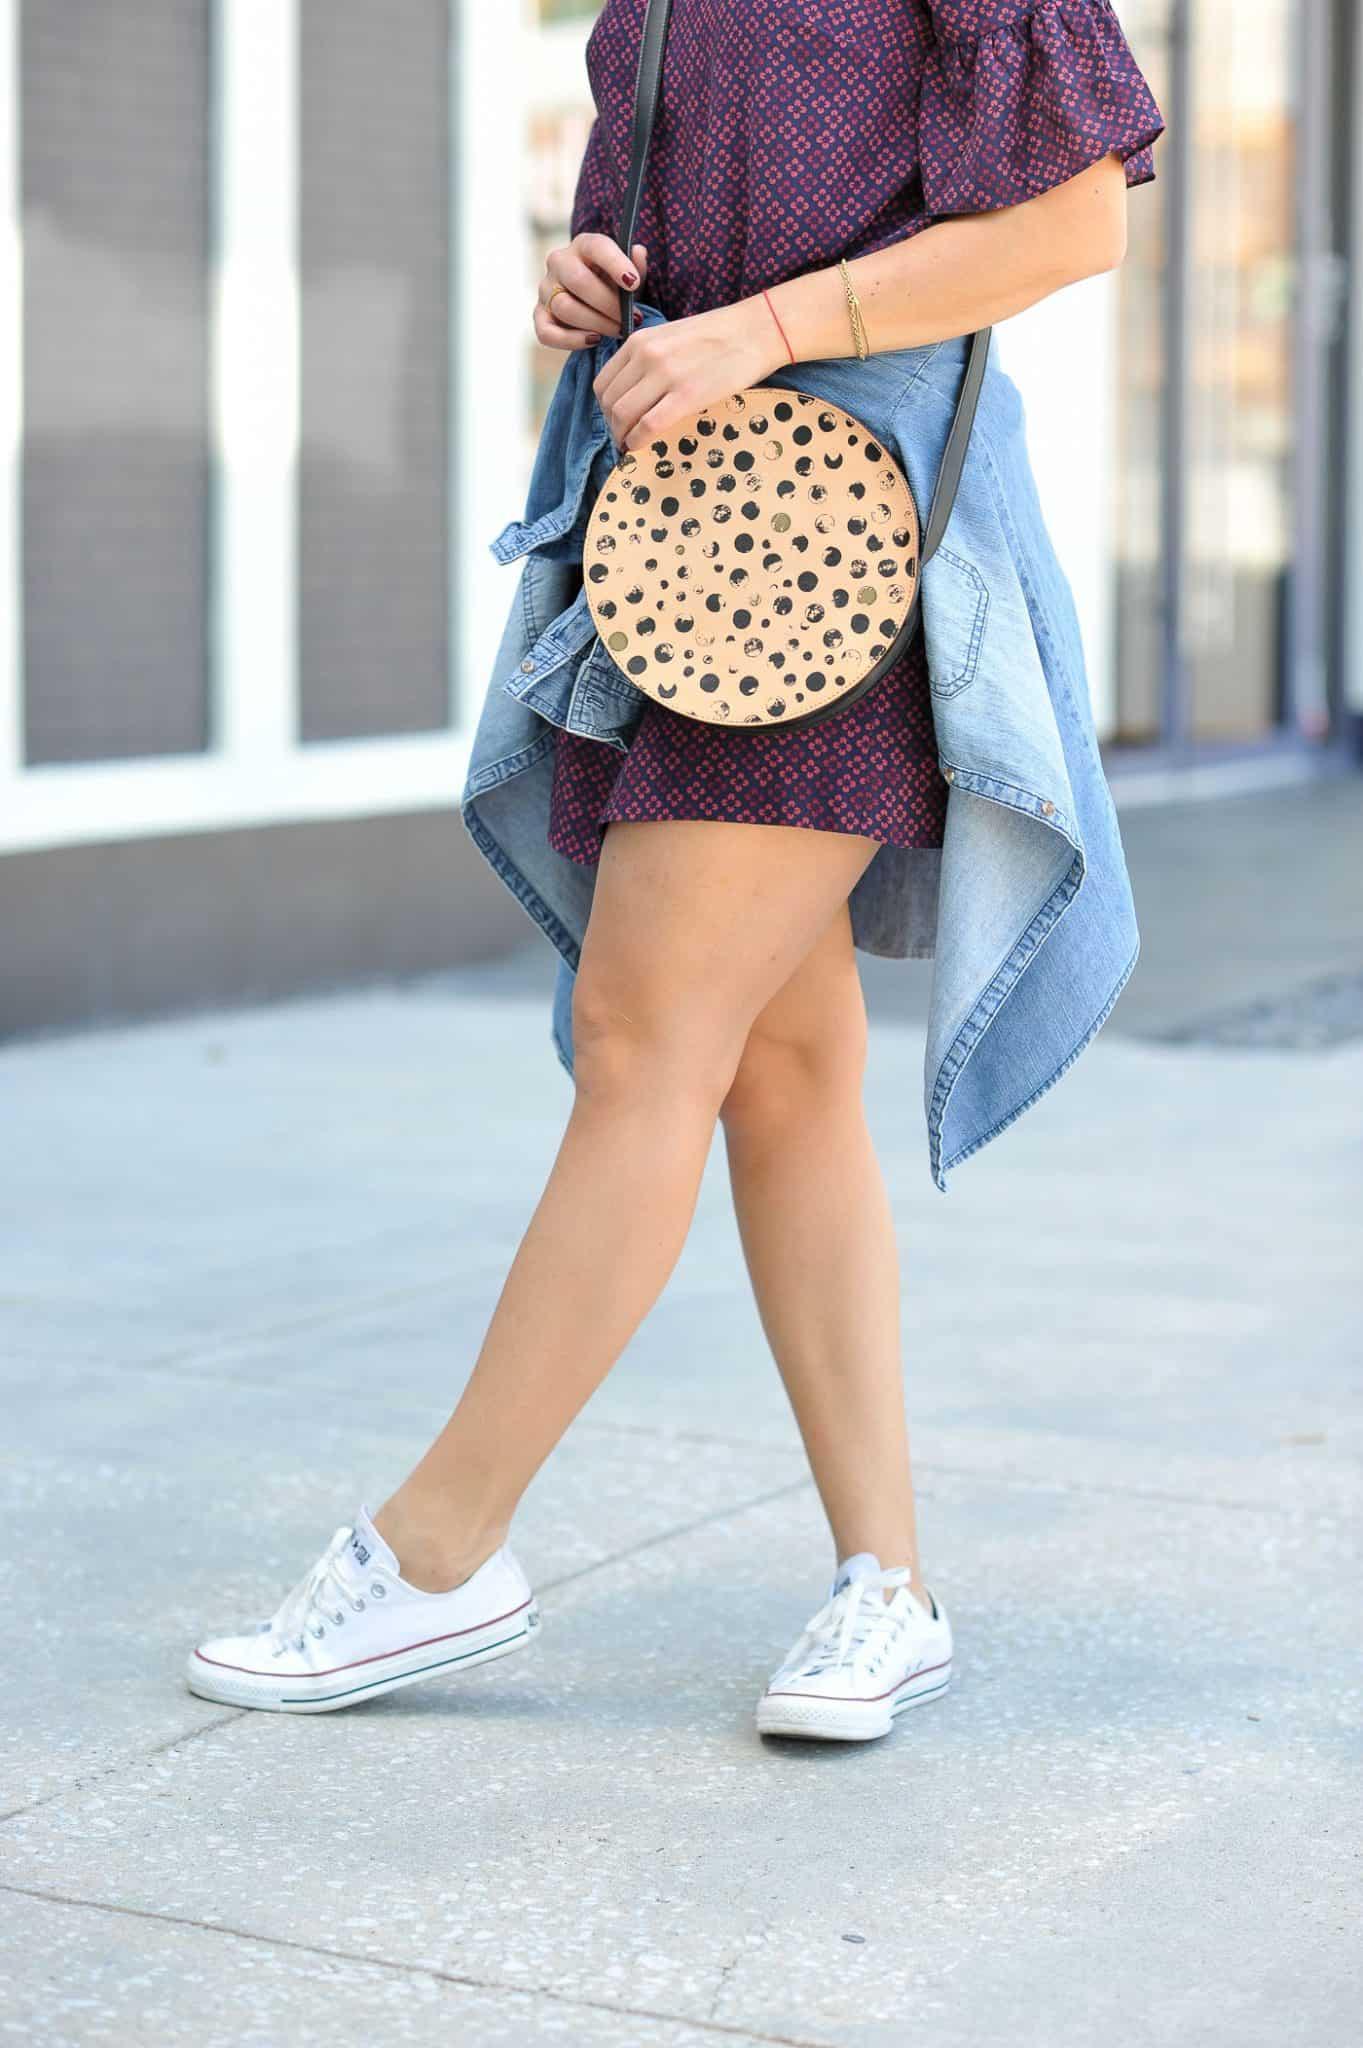 Ways to wear Converse sneakers, circle purse - My Style Vita @mystylevita